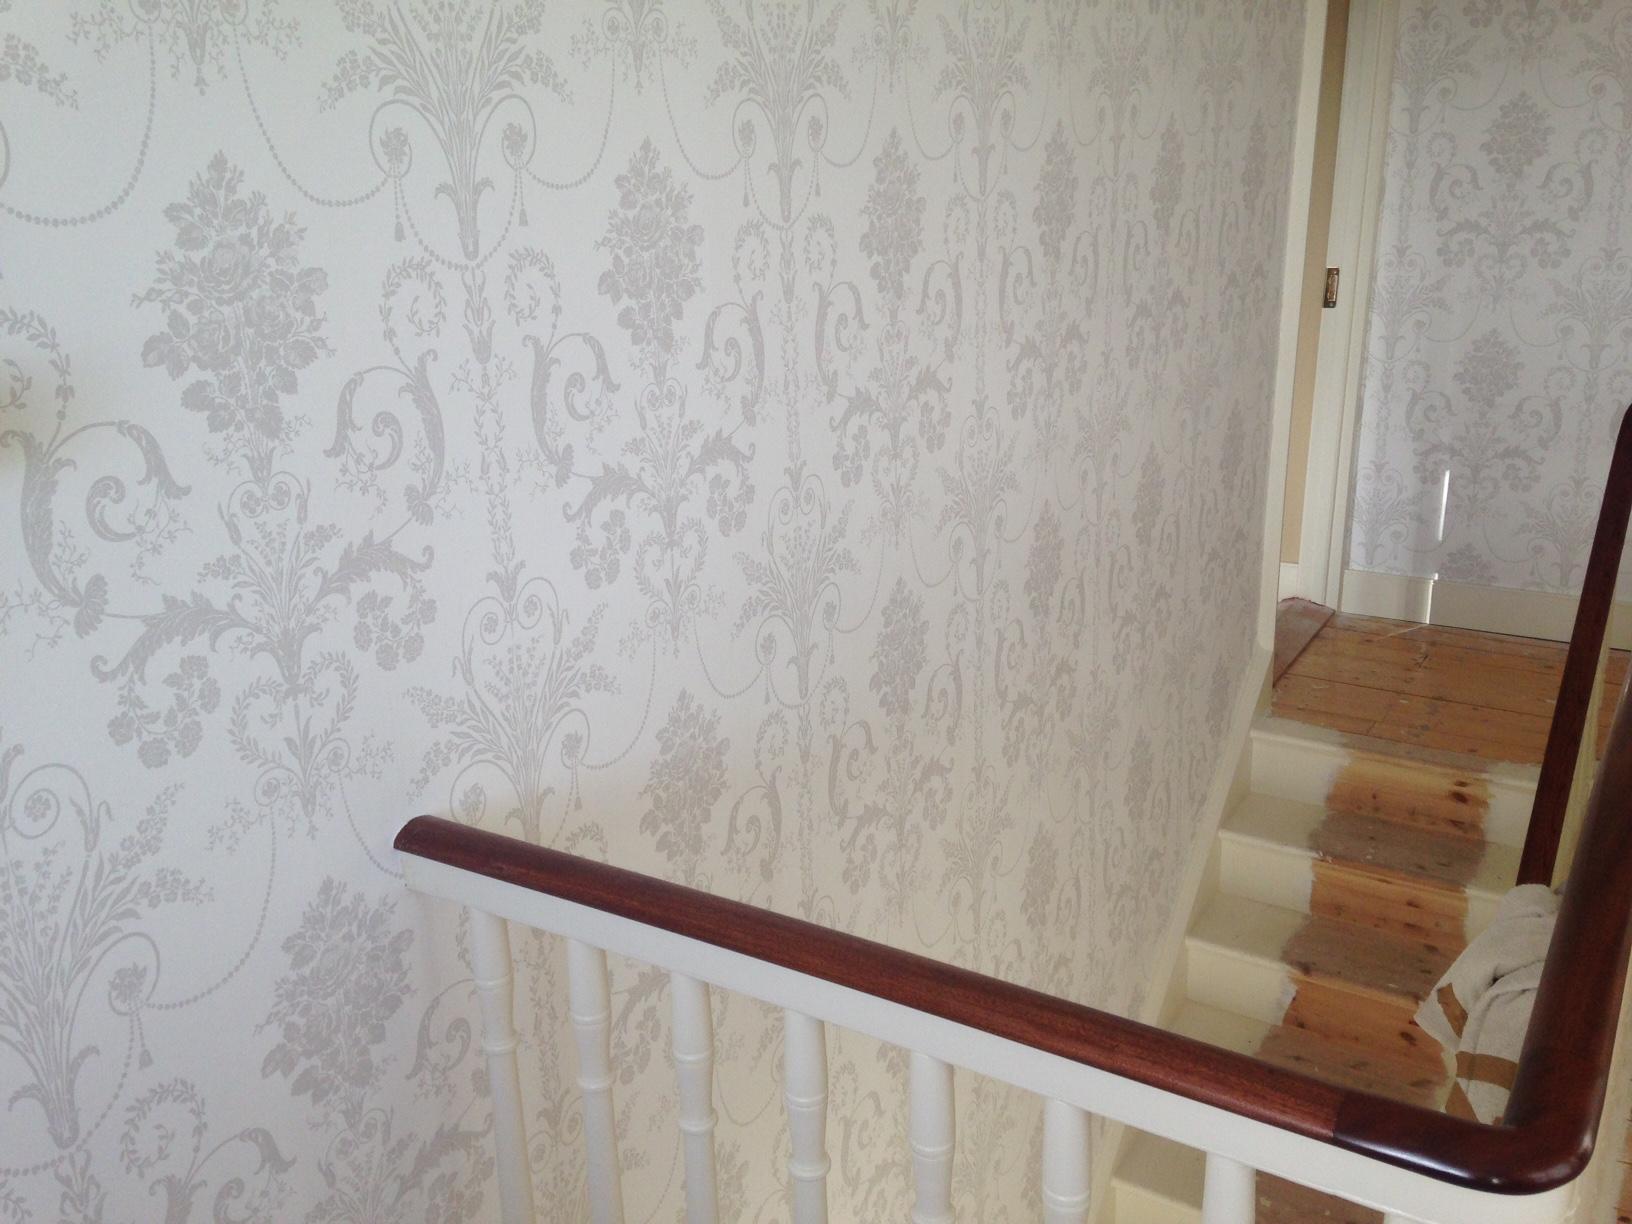 Wallpapering – The Decorators